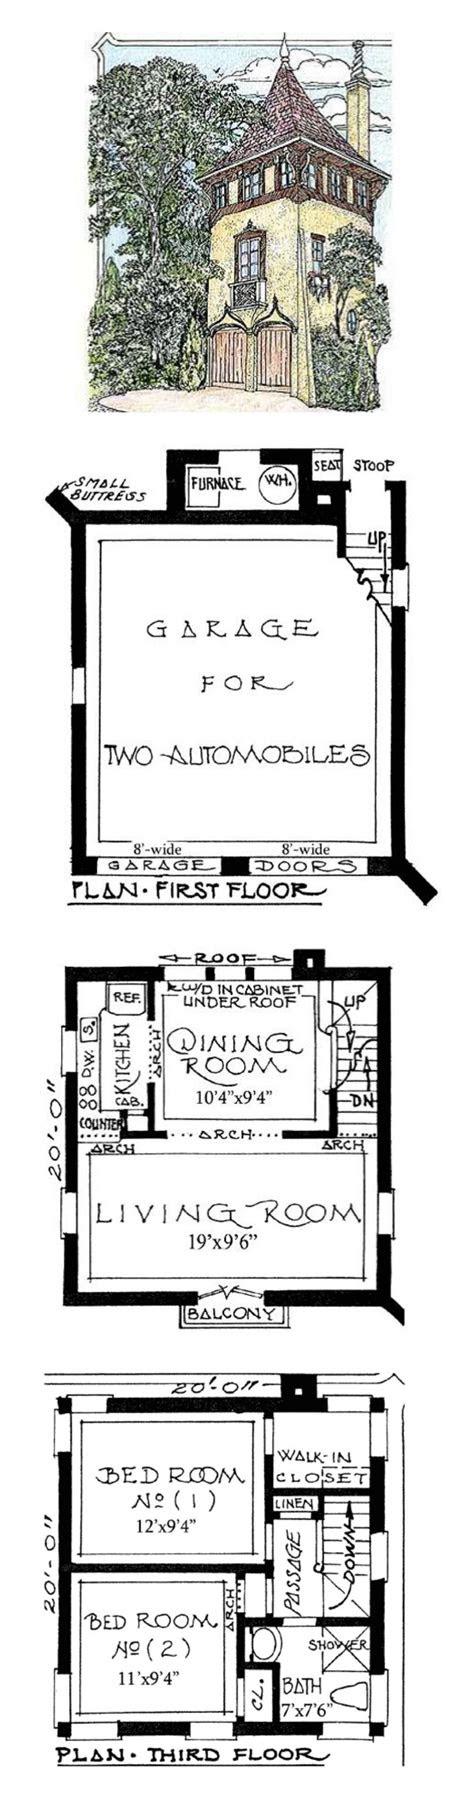 architectural designs romantic carriage house plans